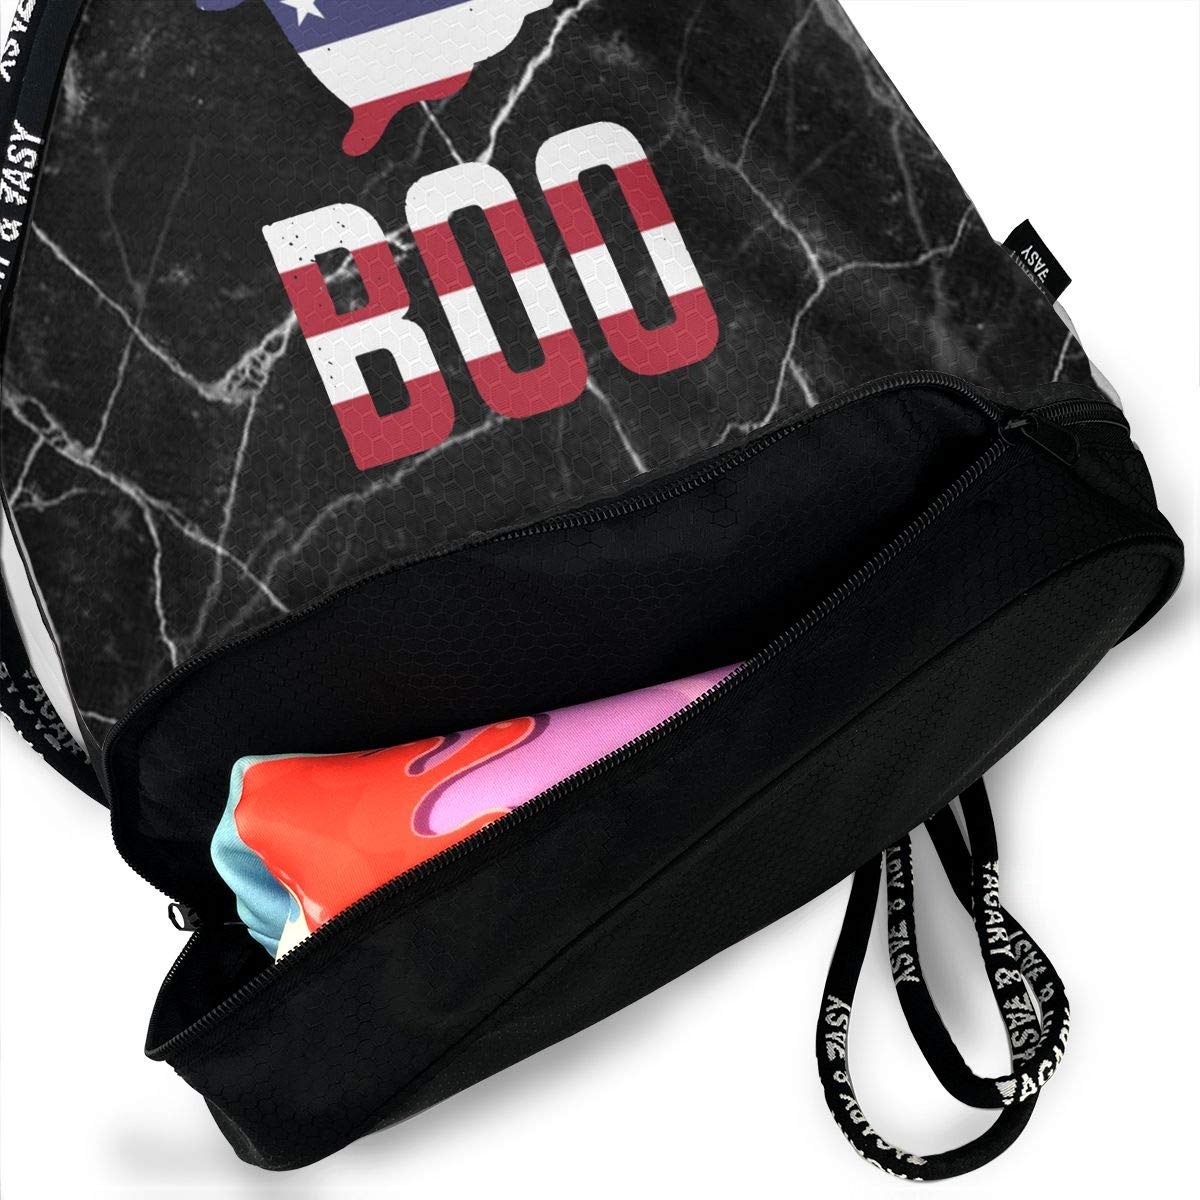 Drawstring Sports Backpack Boo Ghost American Flag Men and Women Gym Sport Yoga Rucksack Shoulder Bags